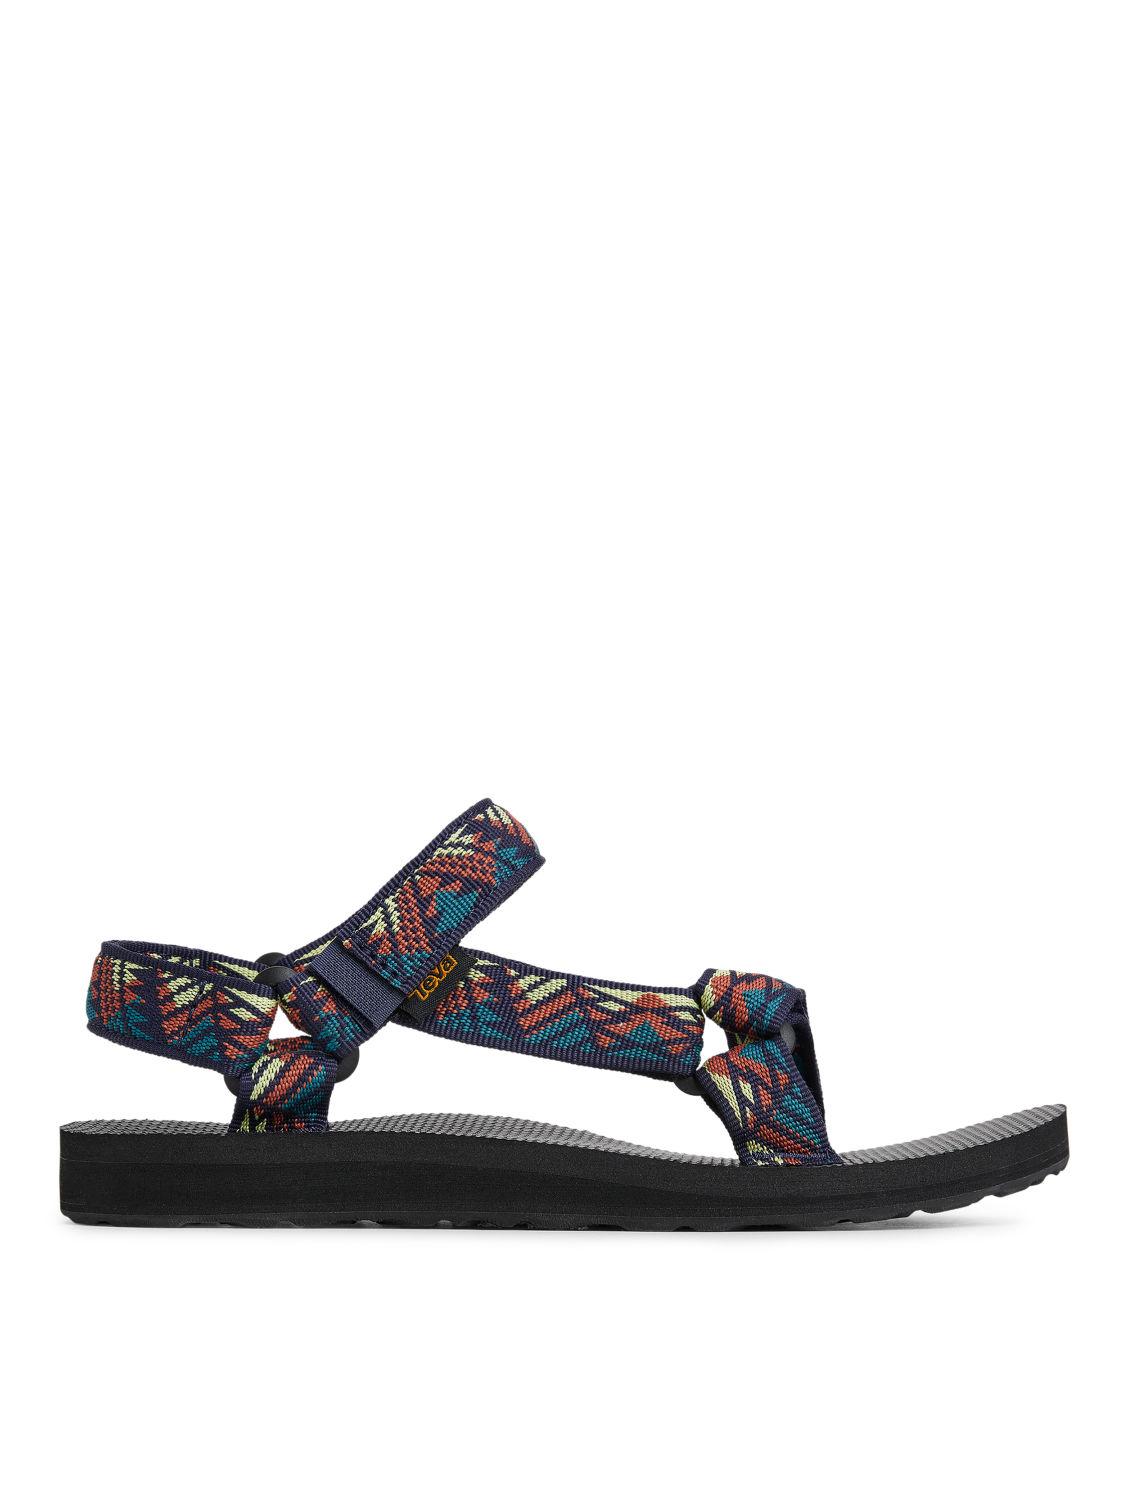 Teva Original Universal Sandals Blue Pattern Shoes ARKET